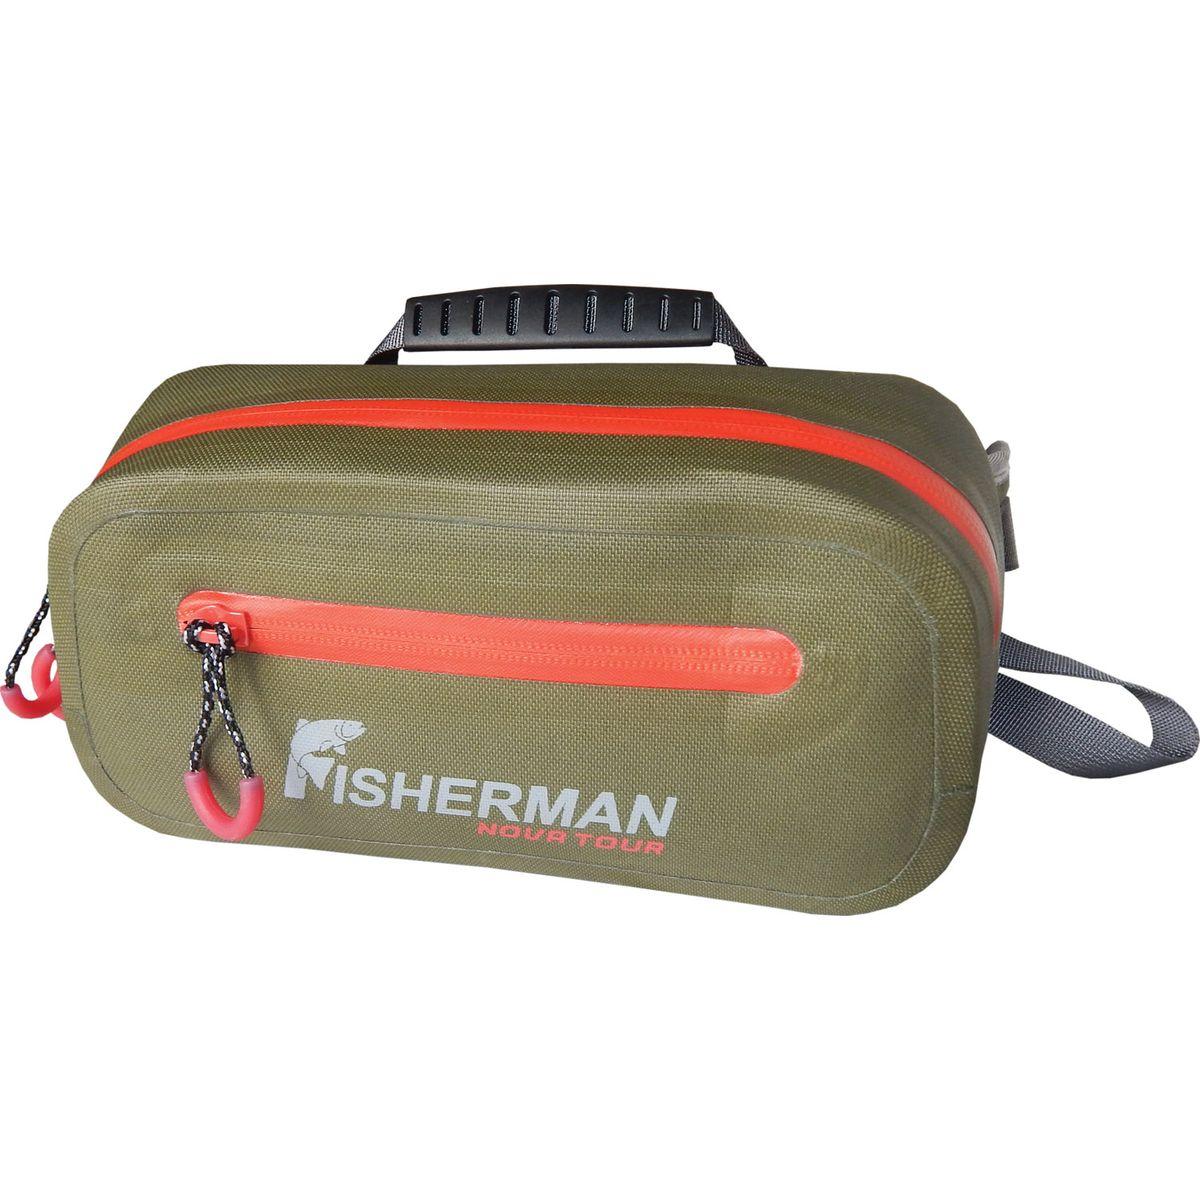 Сумка Fisherman Nova Tour Фрог PRO, цвет: хаки, 2 л сумка fisherman nova tour фрог pro цвет хаки 2 л